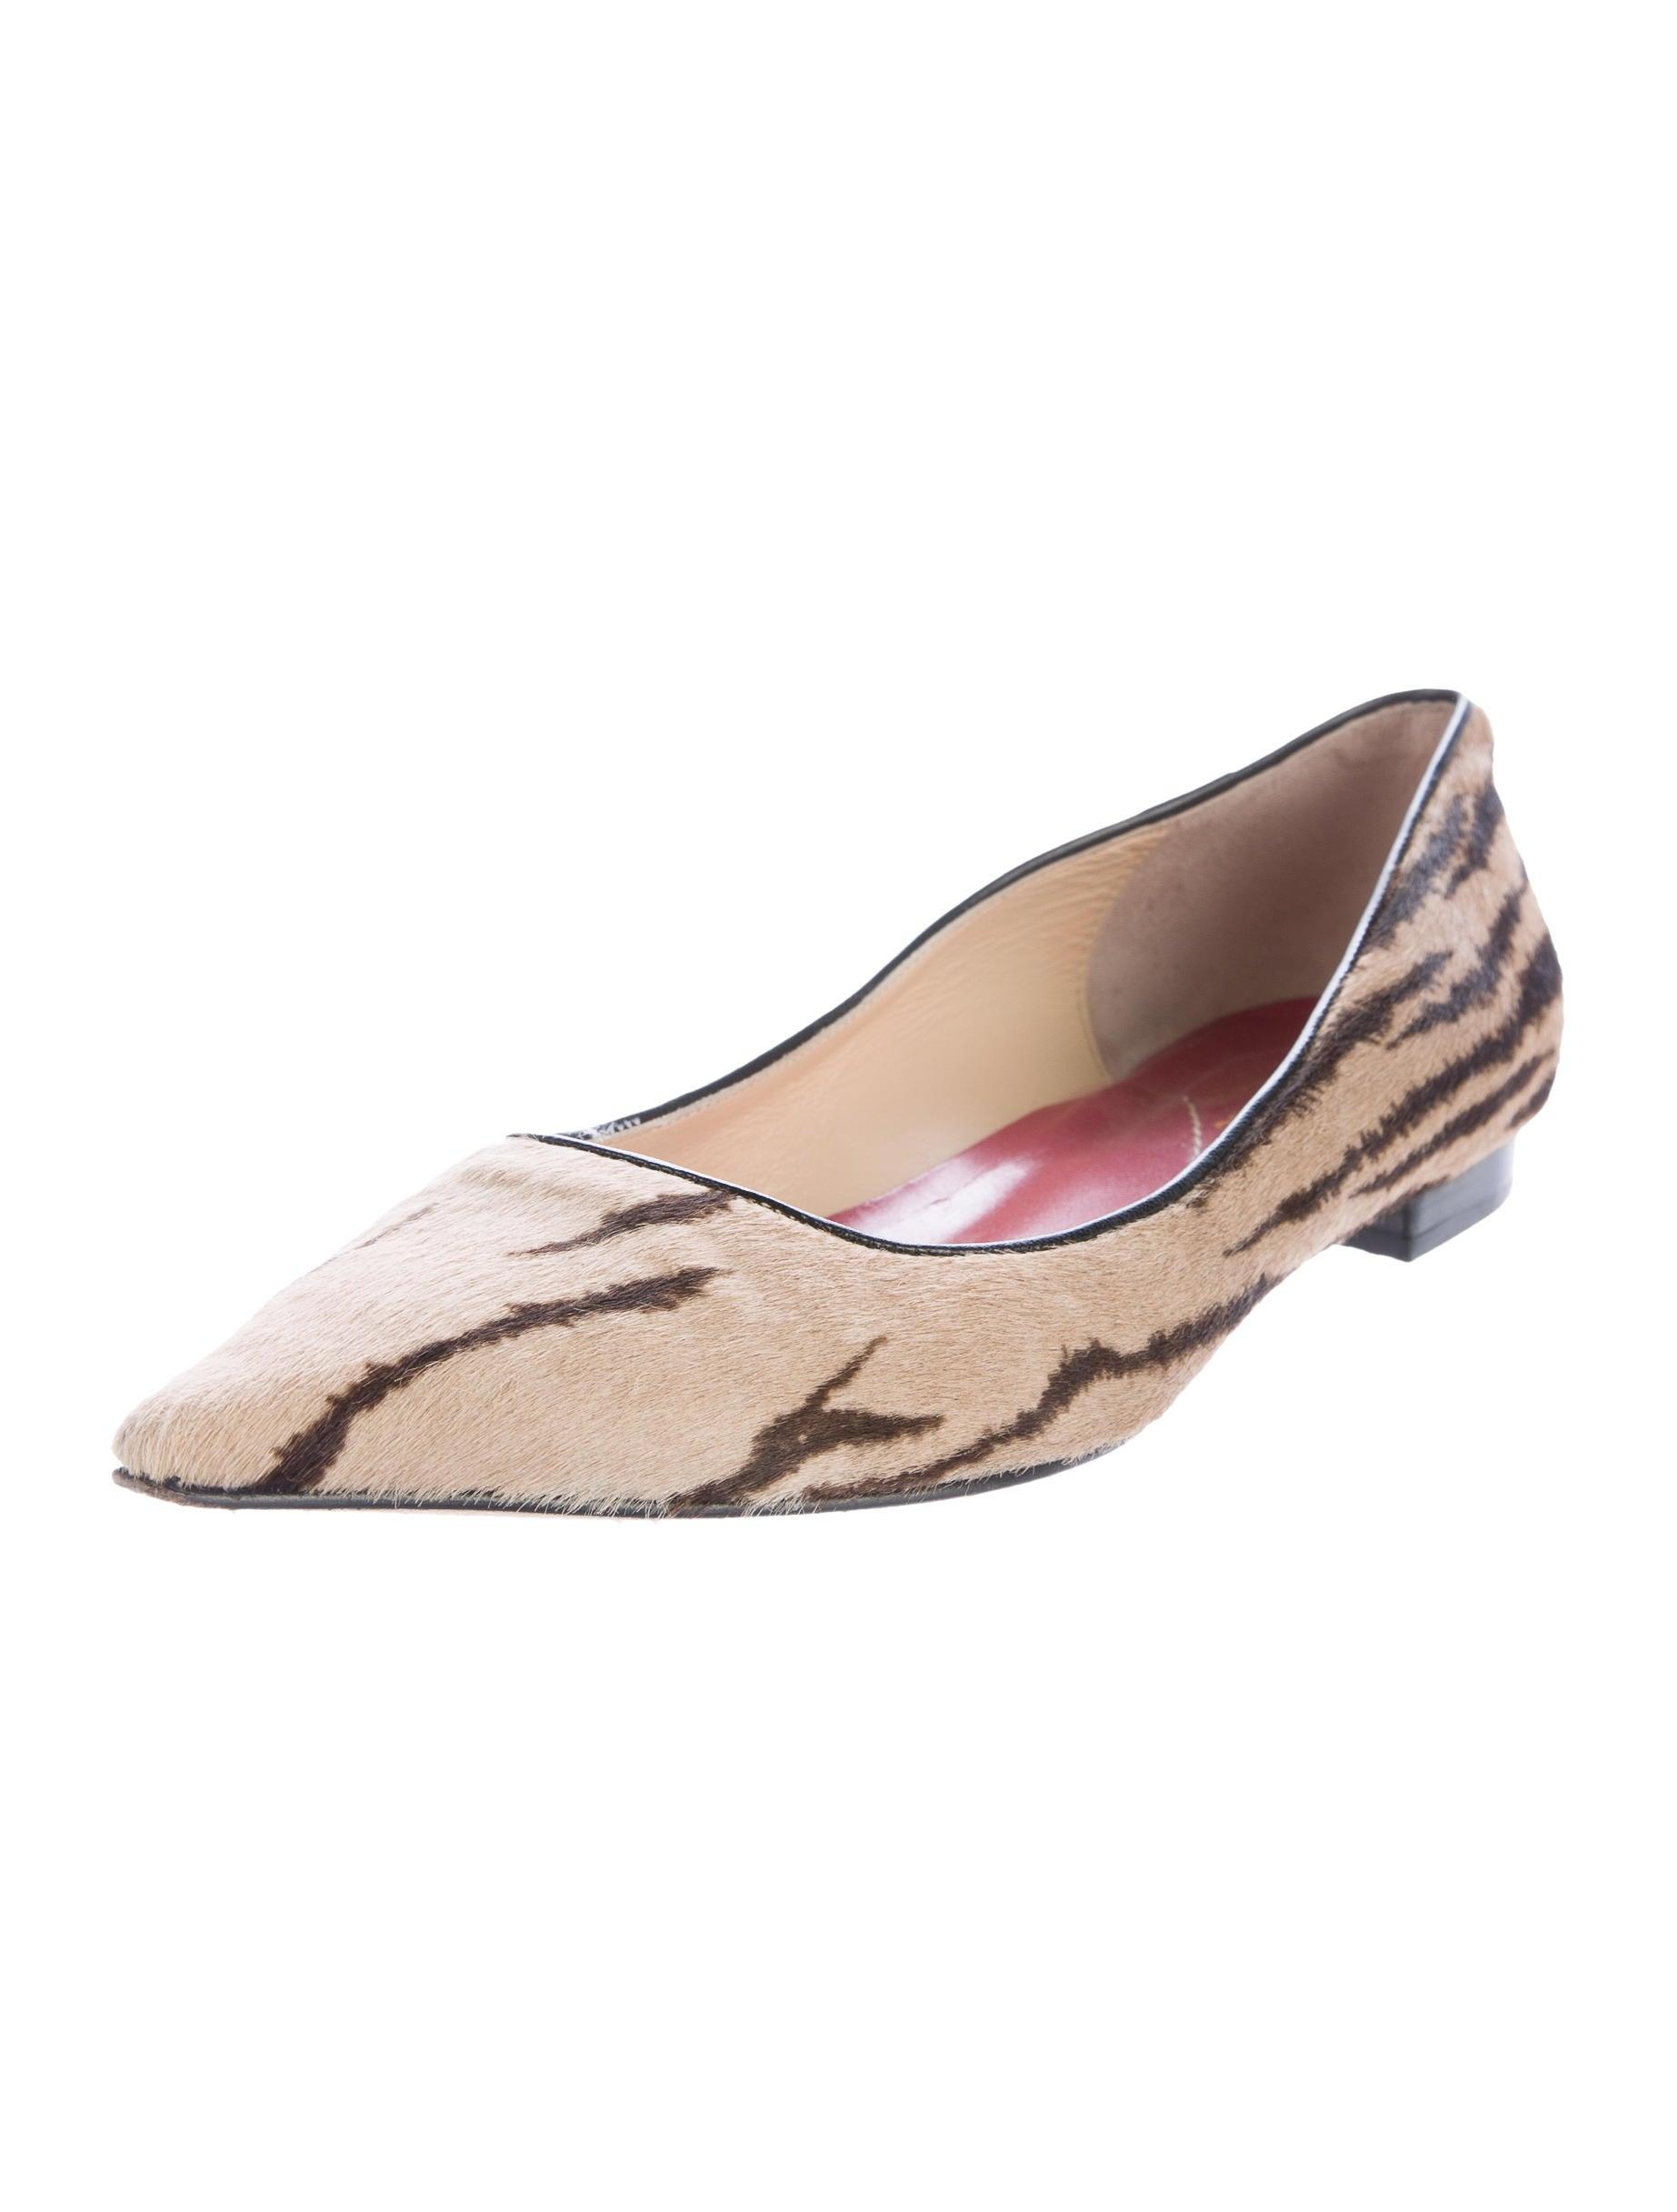 Kate spade new york ponyhair pointed toe flats shoes for Kate spade new york flats